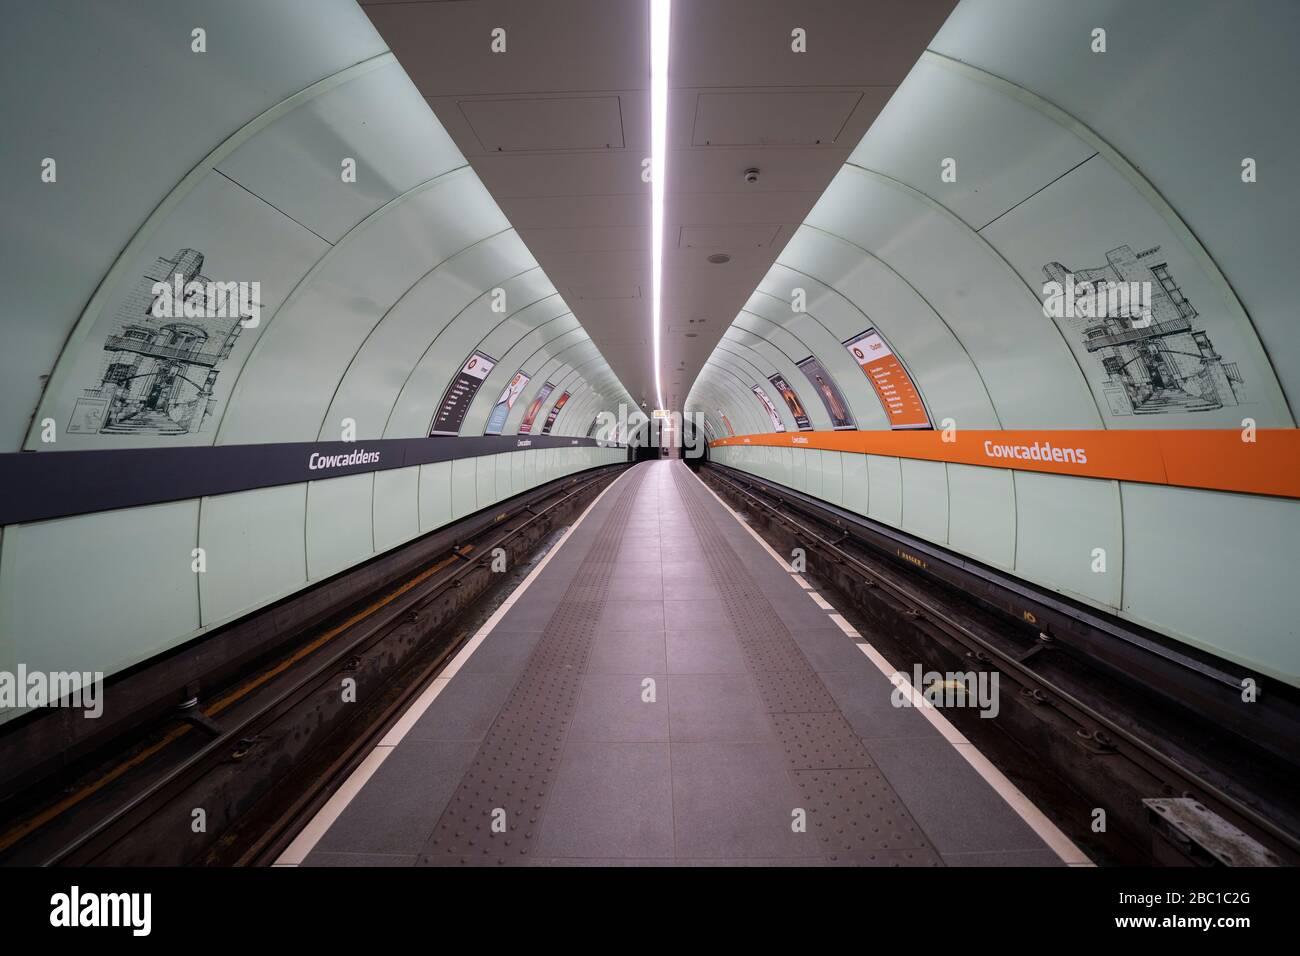 Glasgow, Scotland, UK. 1 April, 2020. Effects of Coronavirus lockdown on Glasgow life, Scotland. Empty platform on the Glasgow Subway. Stock Photo